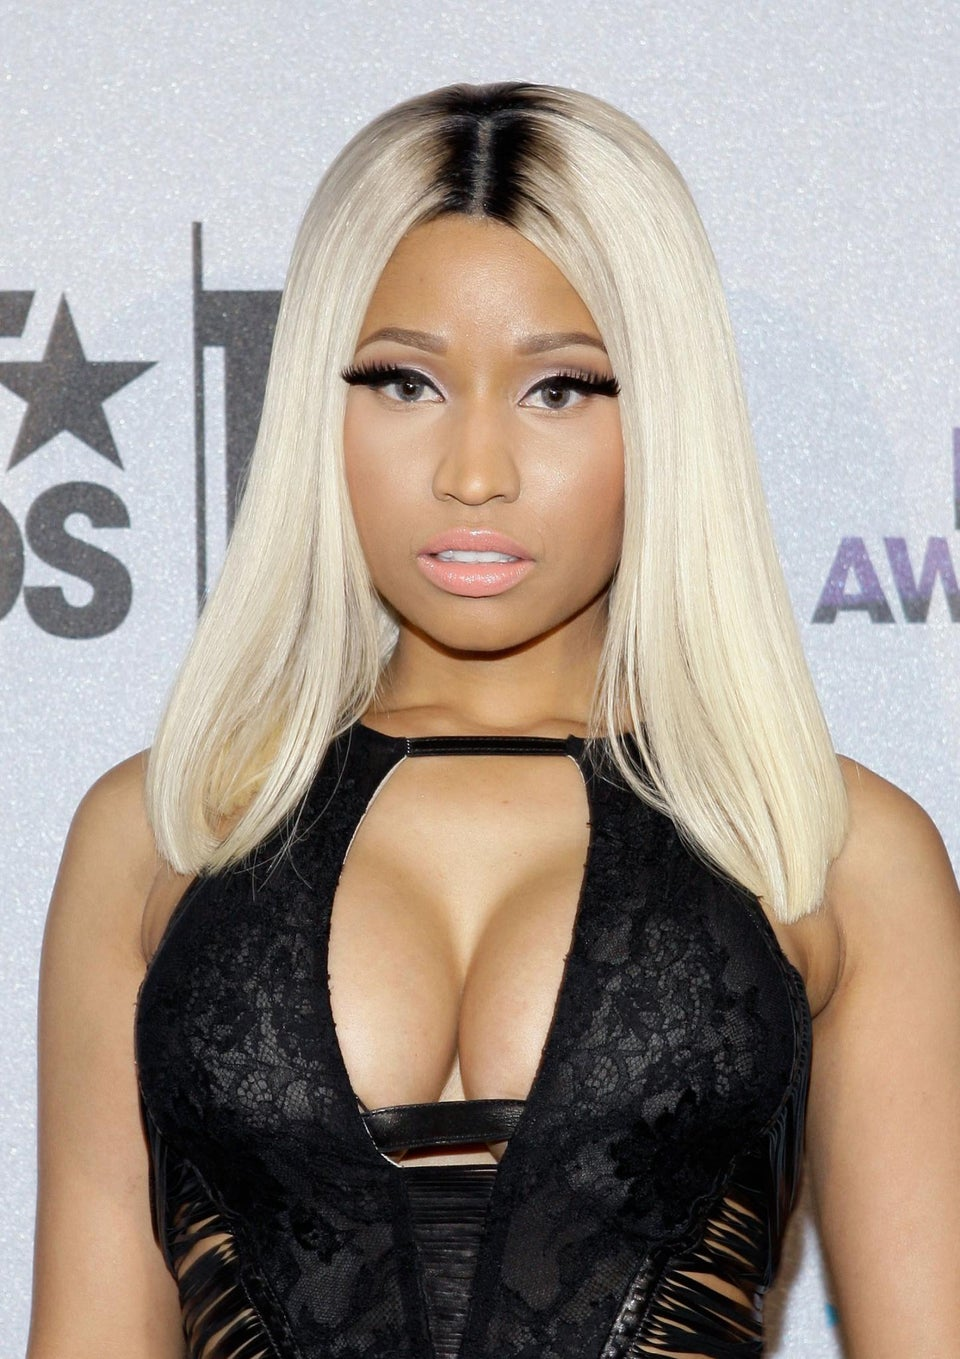 Nicki Minaj Receives $75K Ring From Meek Mill